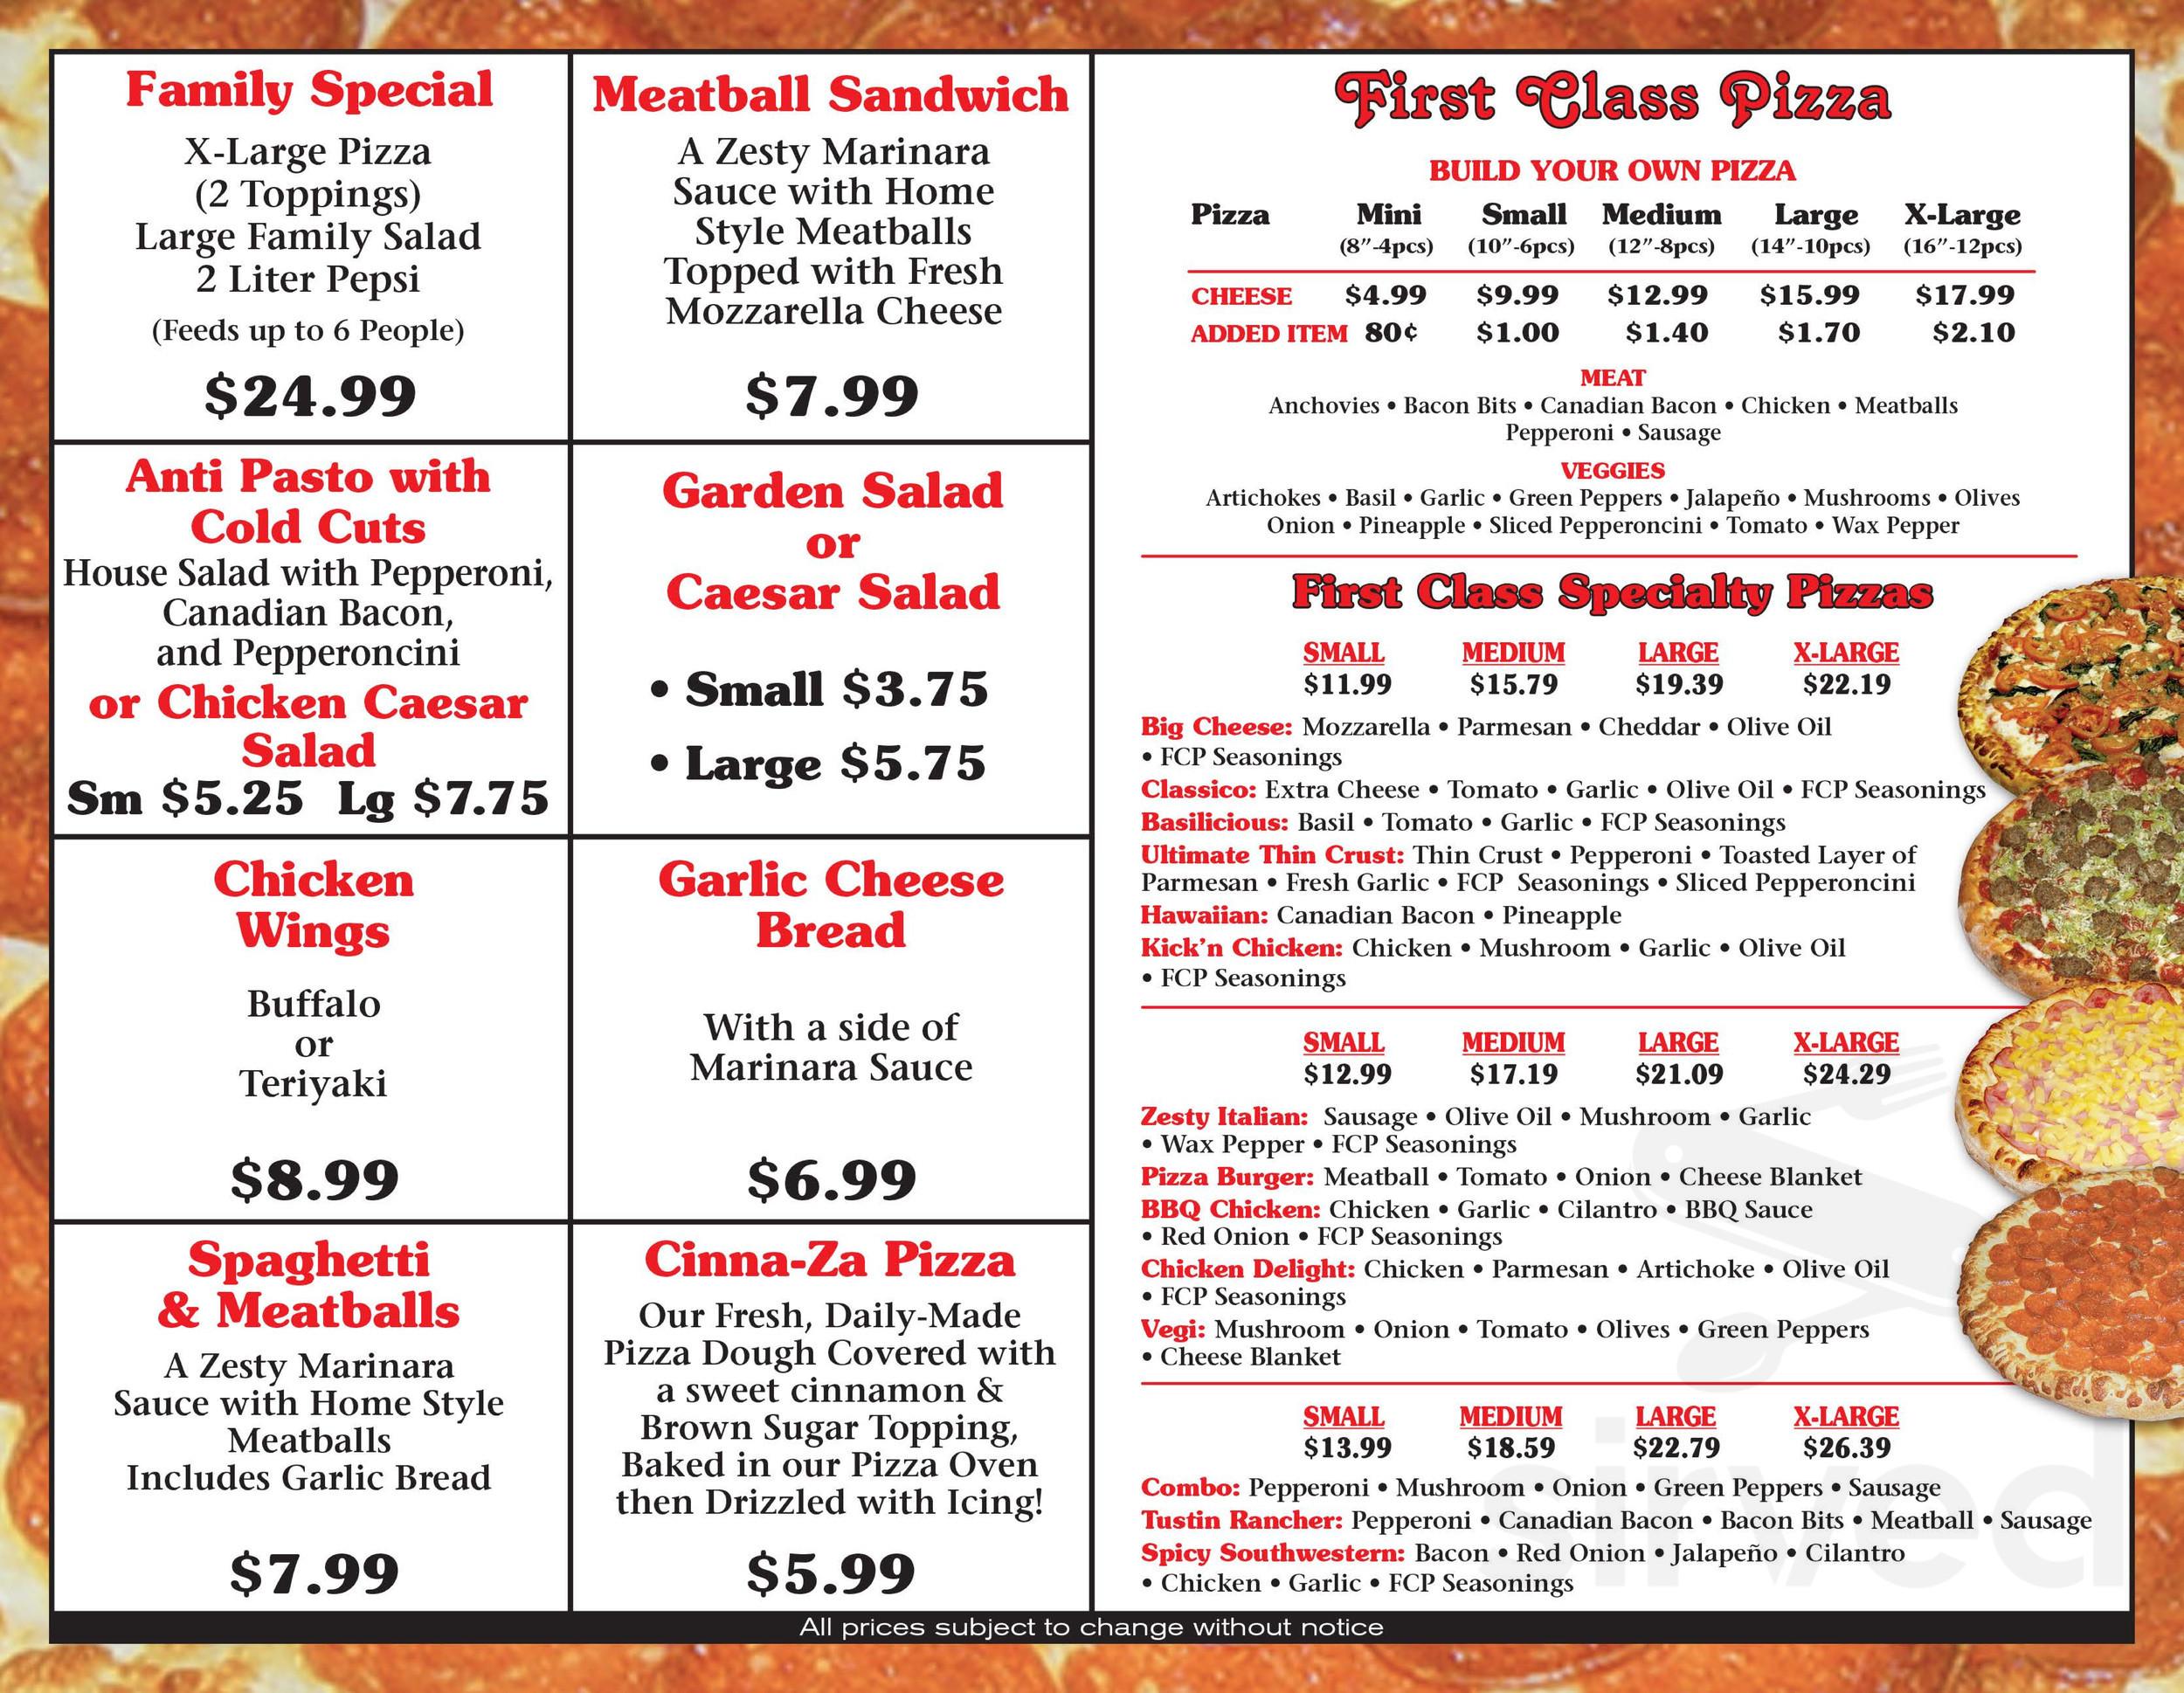 Menu For First Class Pizza In Tustin California Usa